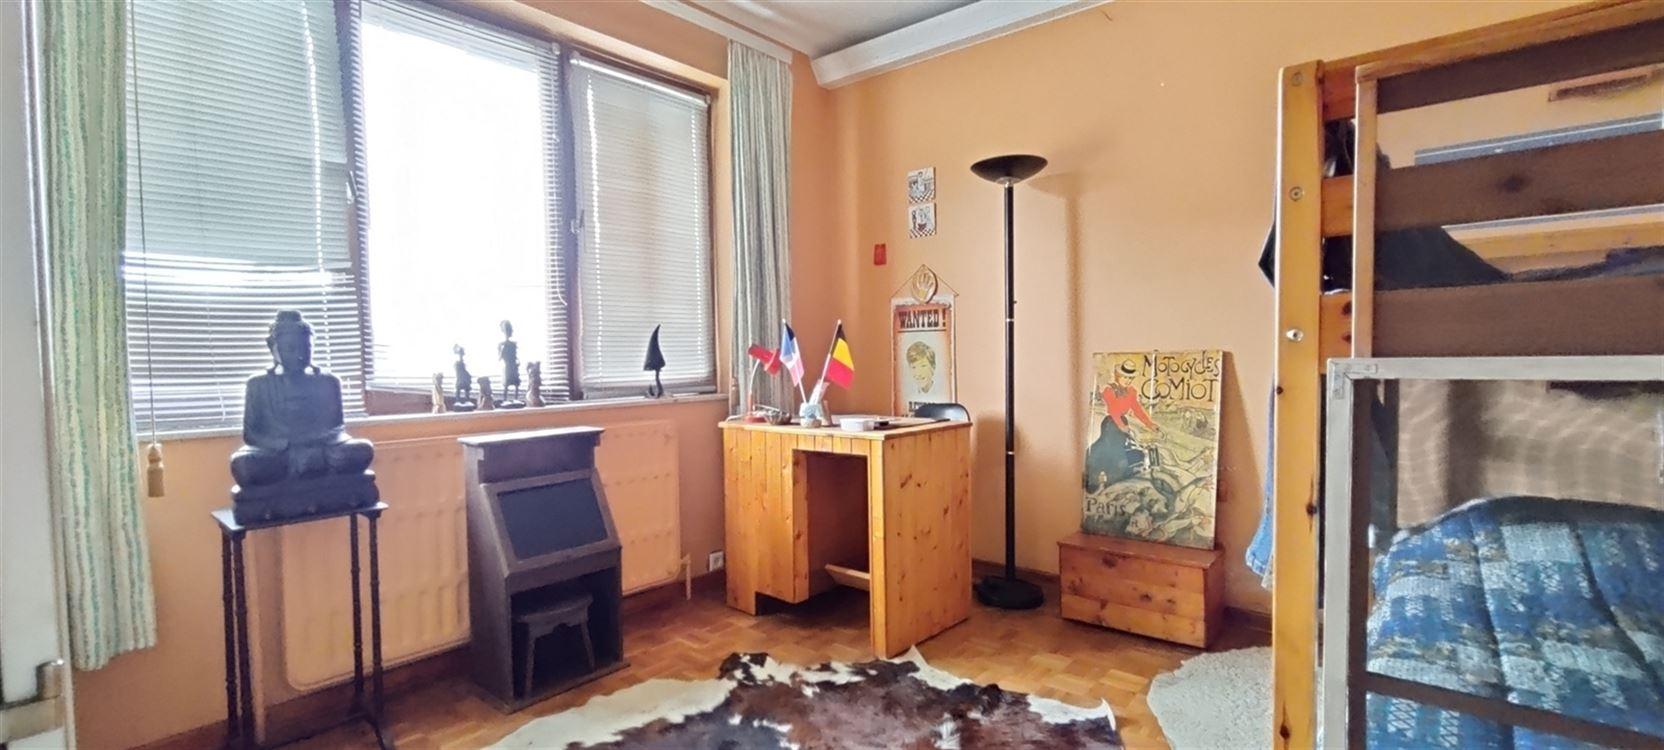 Foto 8 : Huis te 1420 BRAINE-L'ALLEUD (België) - Prijs € 335.000